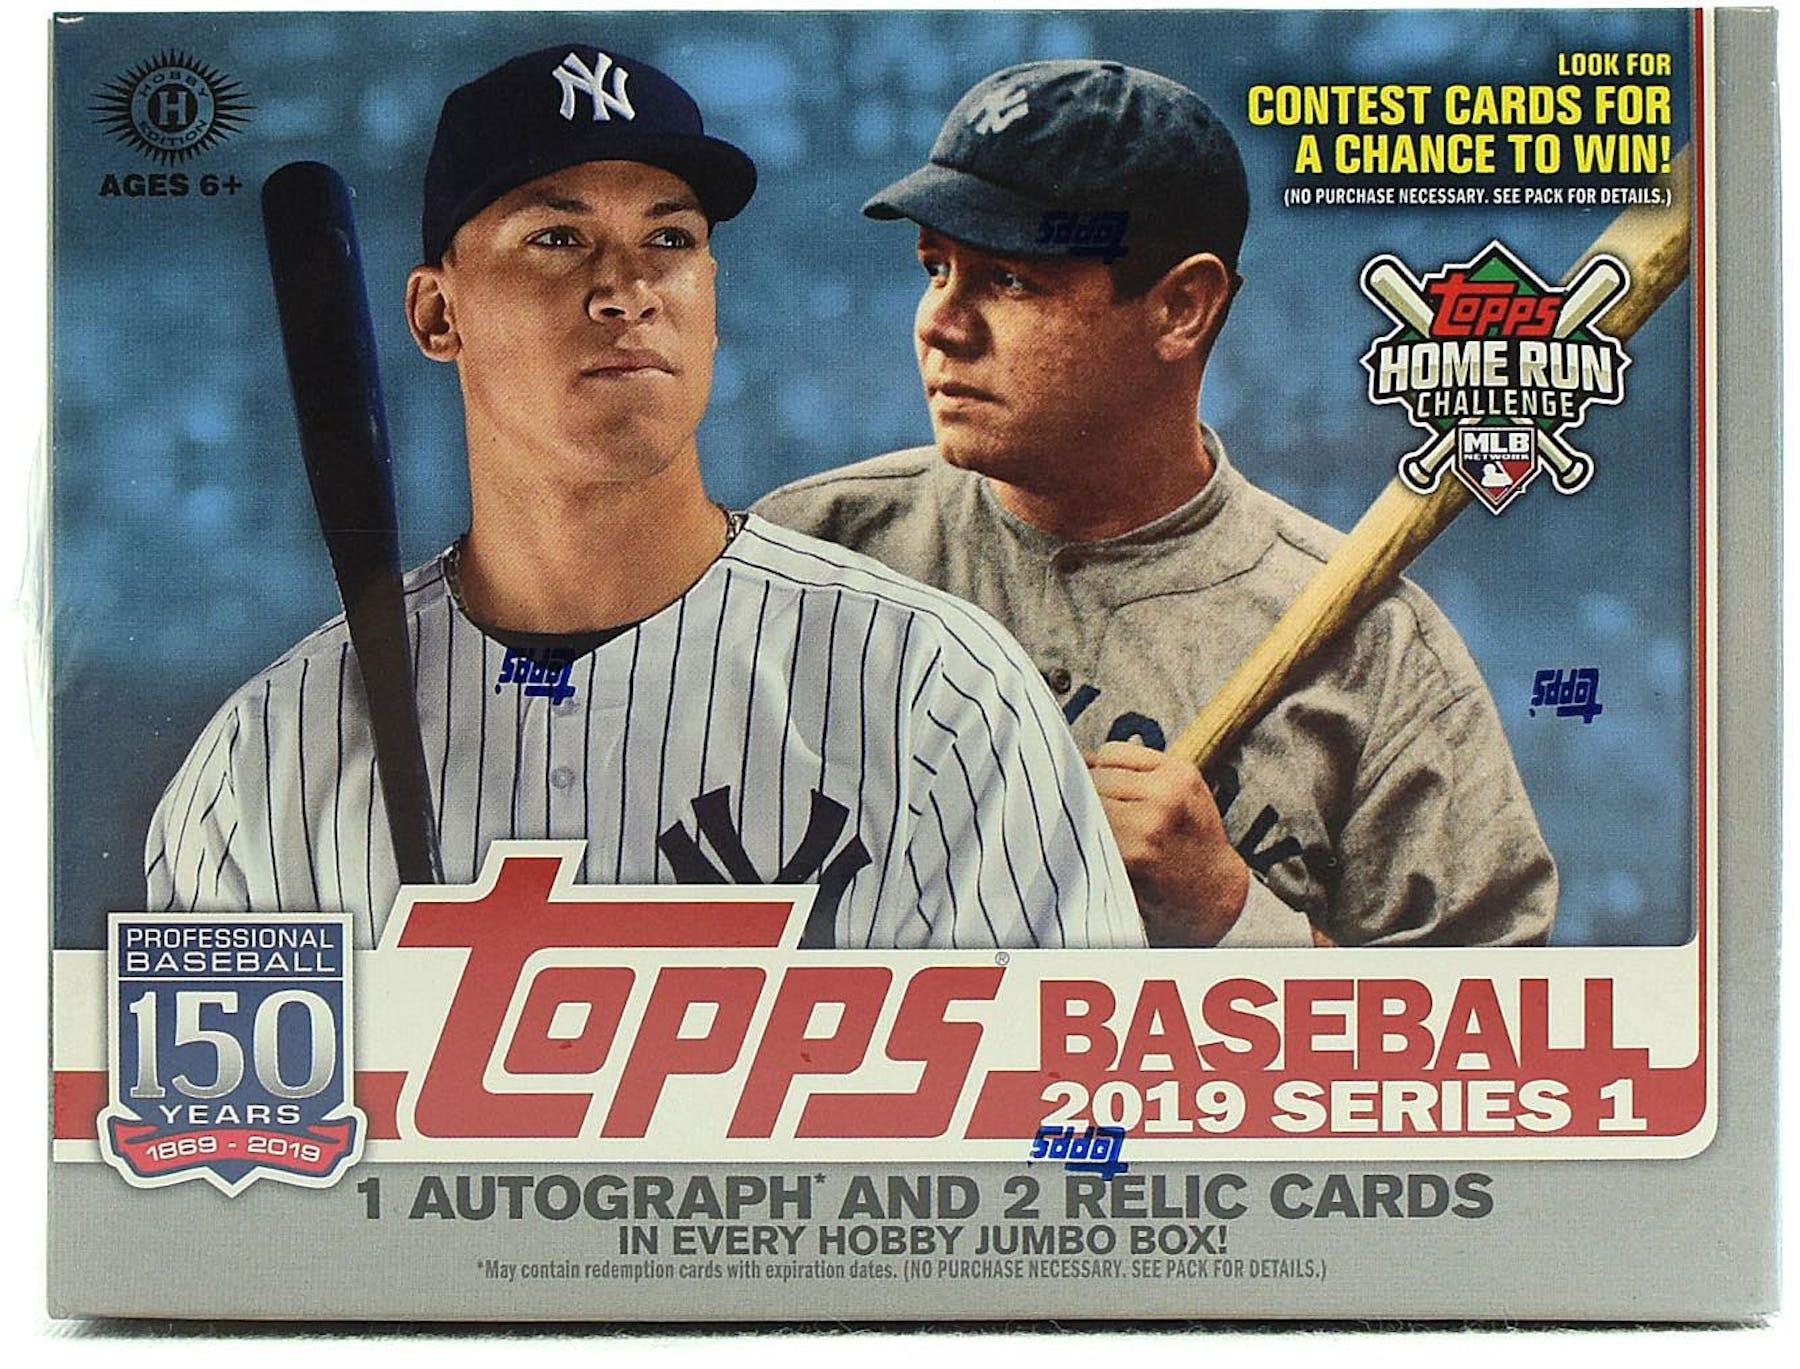 aa666bca0b3 2019 Topps Series 1 Baseball Hobby Jumbo Box (PLUS 2 Silver Packs!)